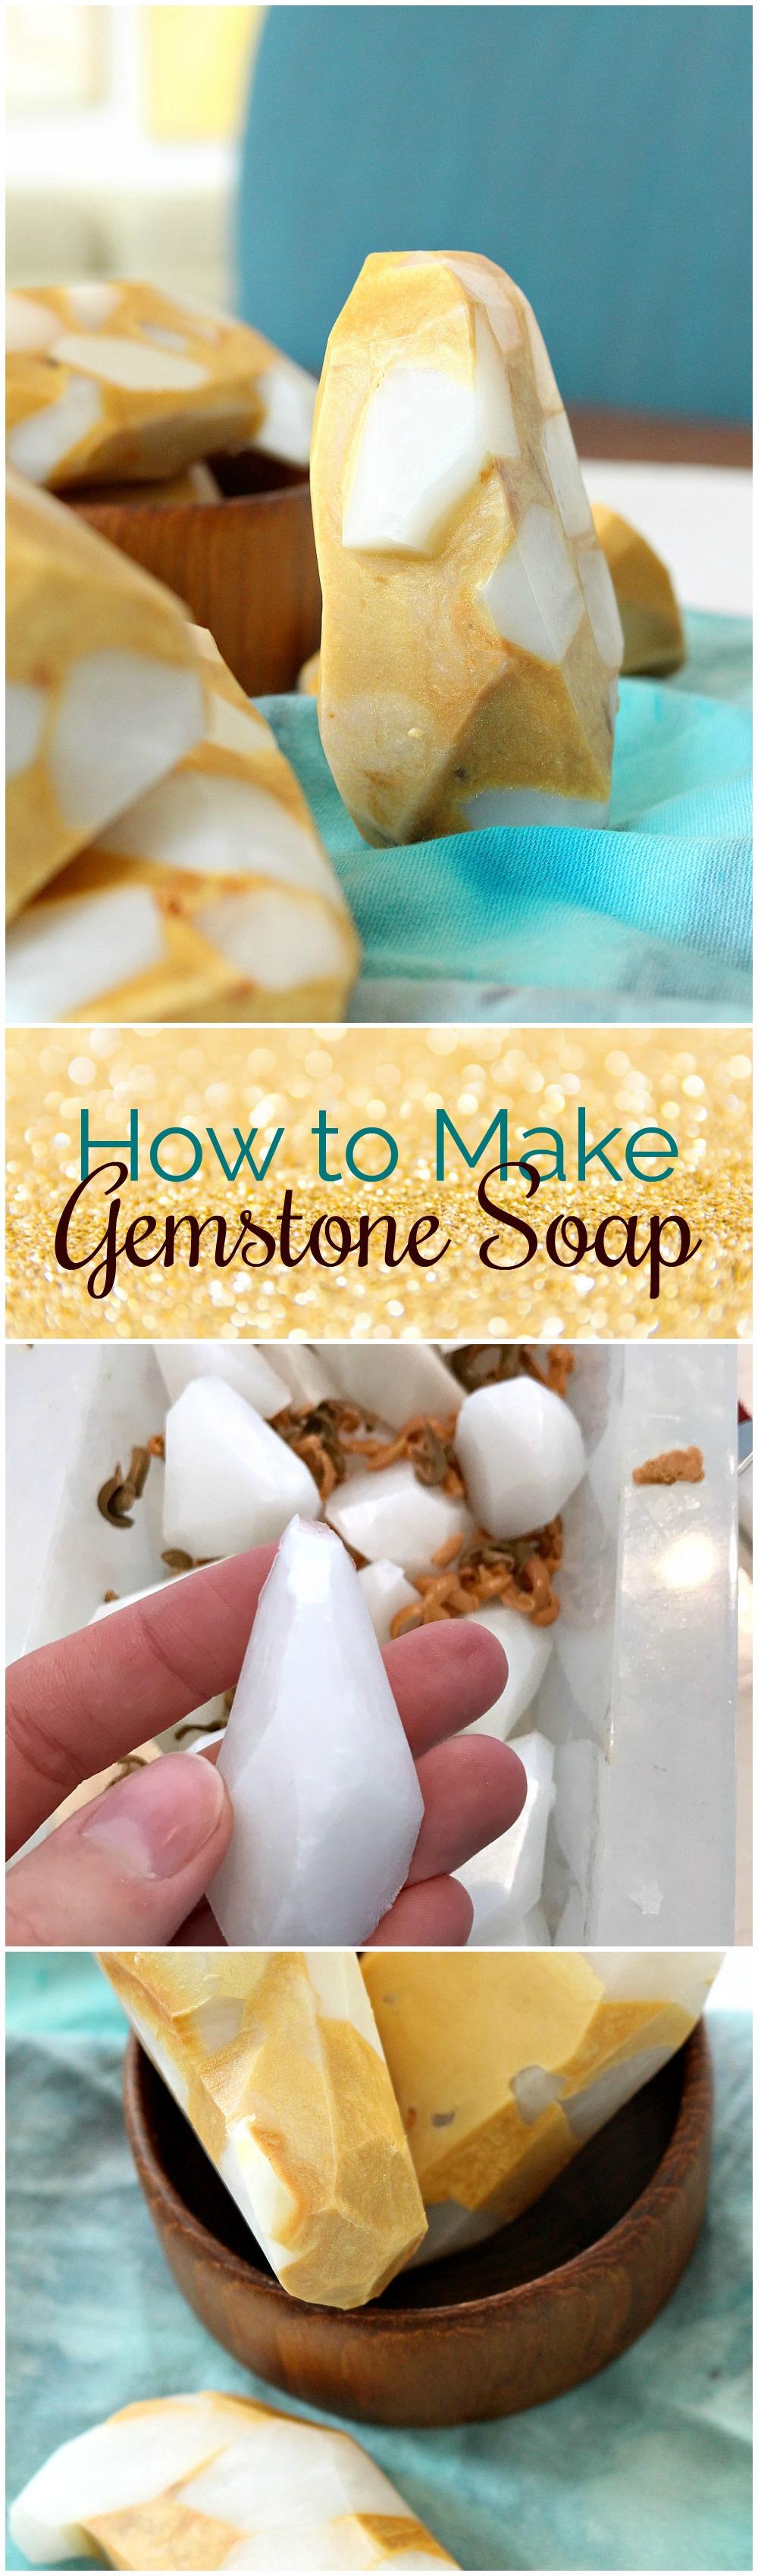 DIY gemstone soap tutorial